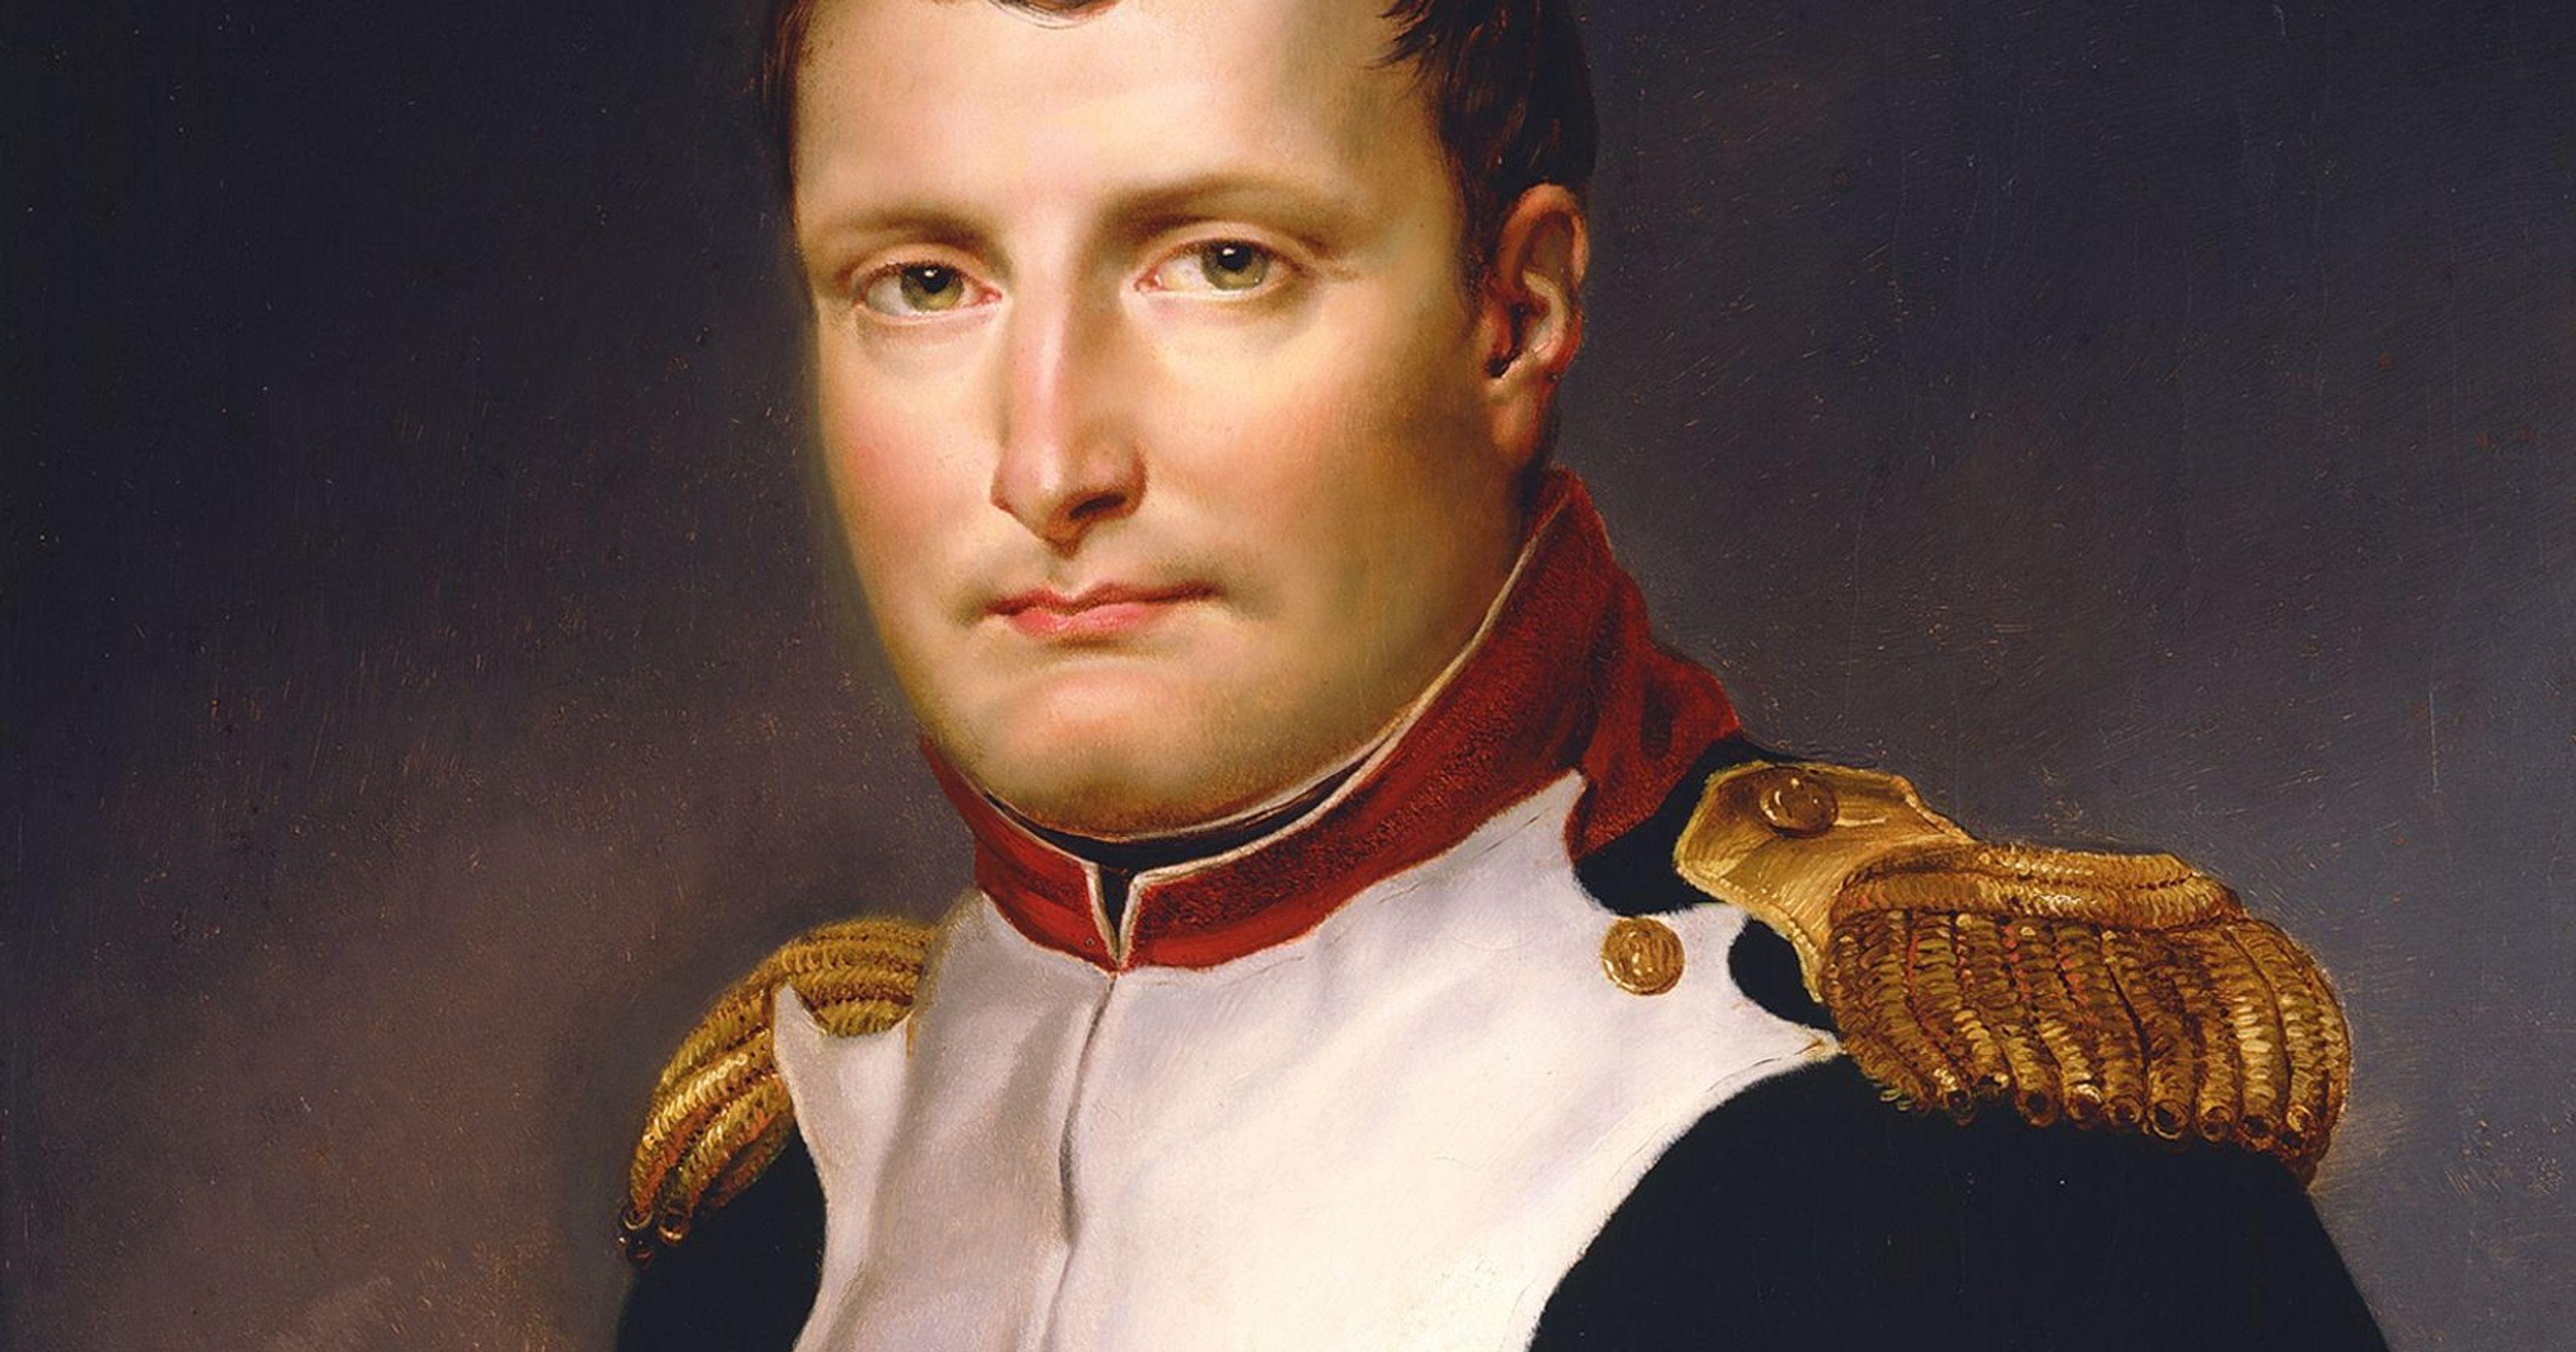 636353139404147560 C01 AlmostLastWord Napoleon Bonaparte 031115 - Donald Trump's Nether Universe, and Napoleon Bonaparte